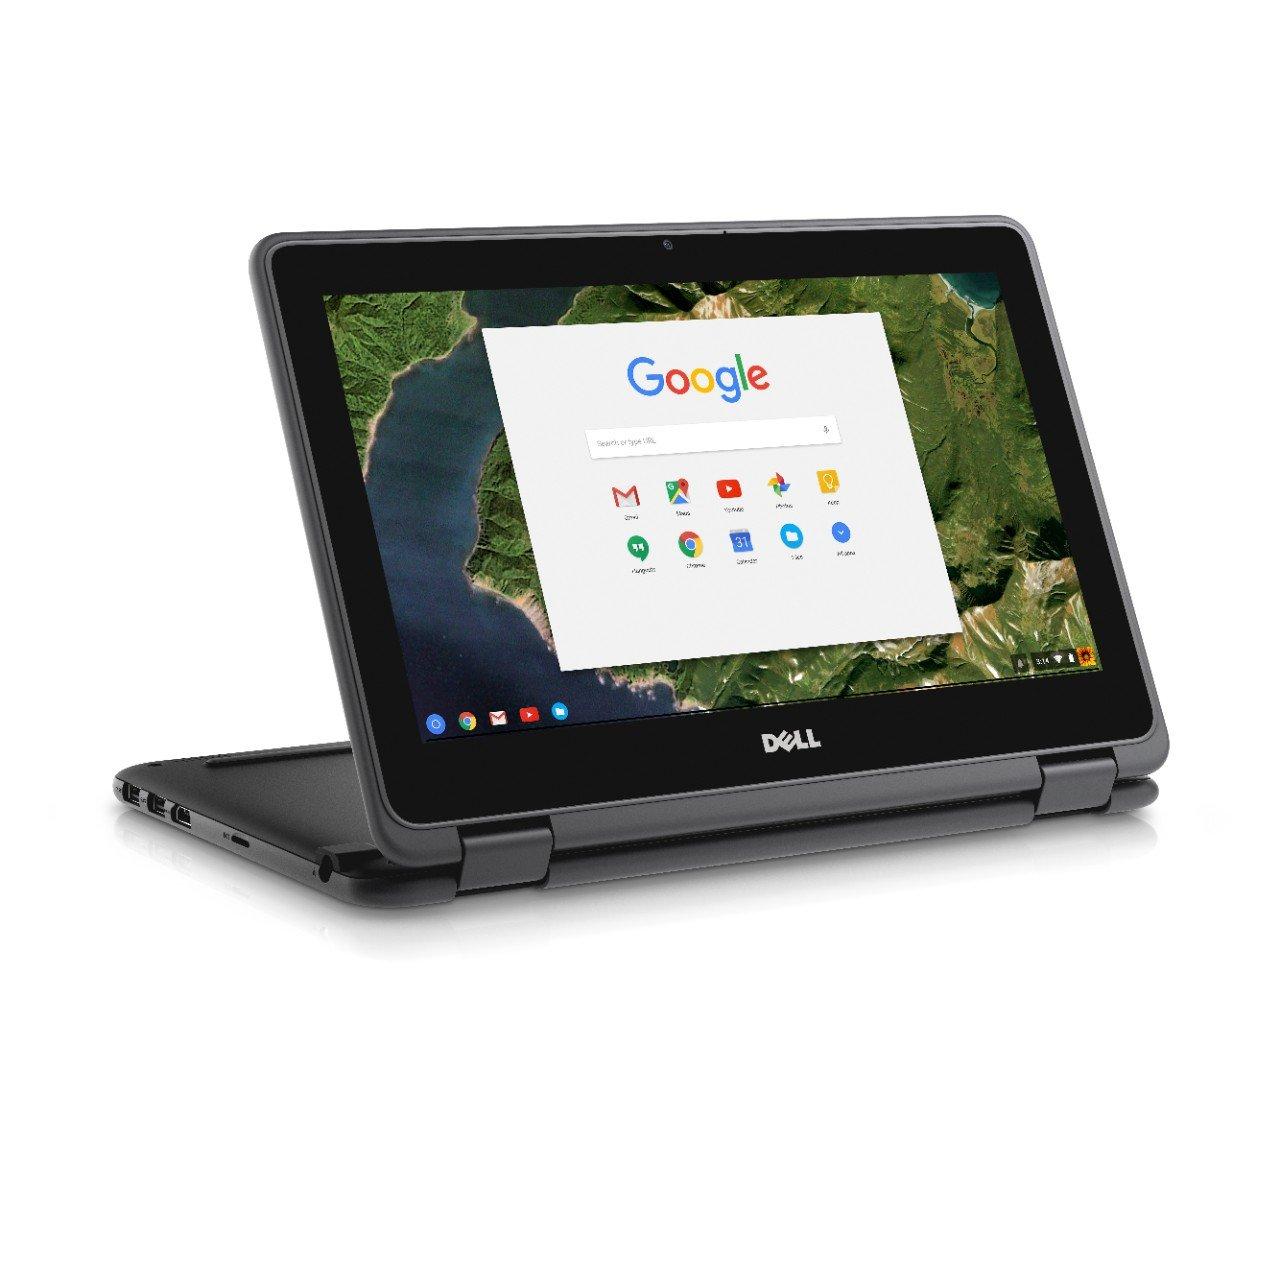 Amazon.com: Dell Chromebook 11 3189 T8TJG 11.6-Inch Traditional Laptop  (Black): Computers & Accessories